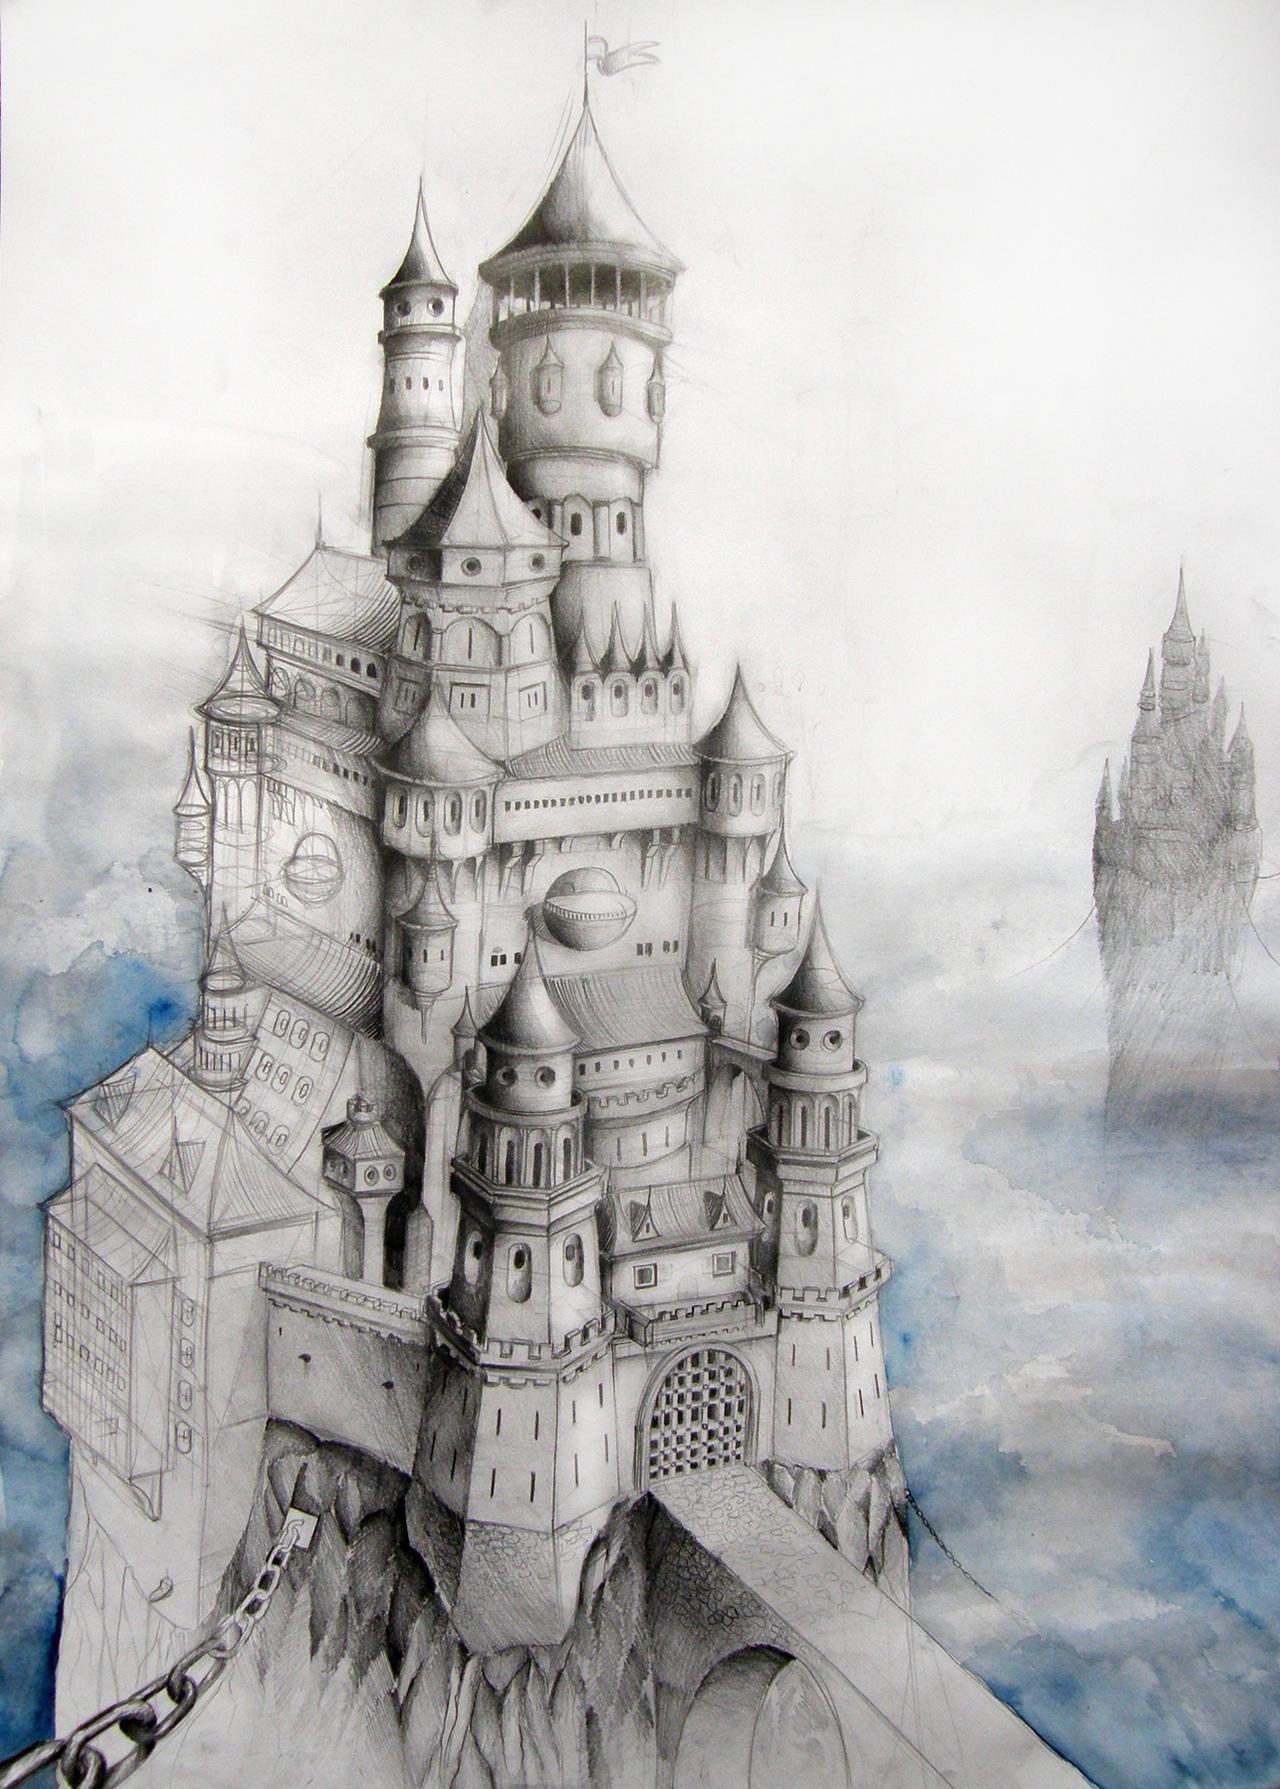 Cloud Fantasy Castle by AdrianBorgnine on DeviantArt